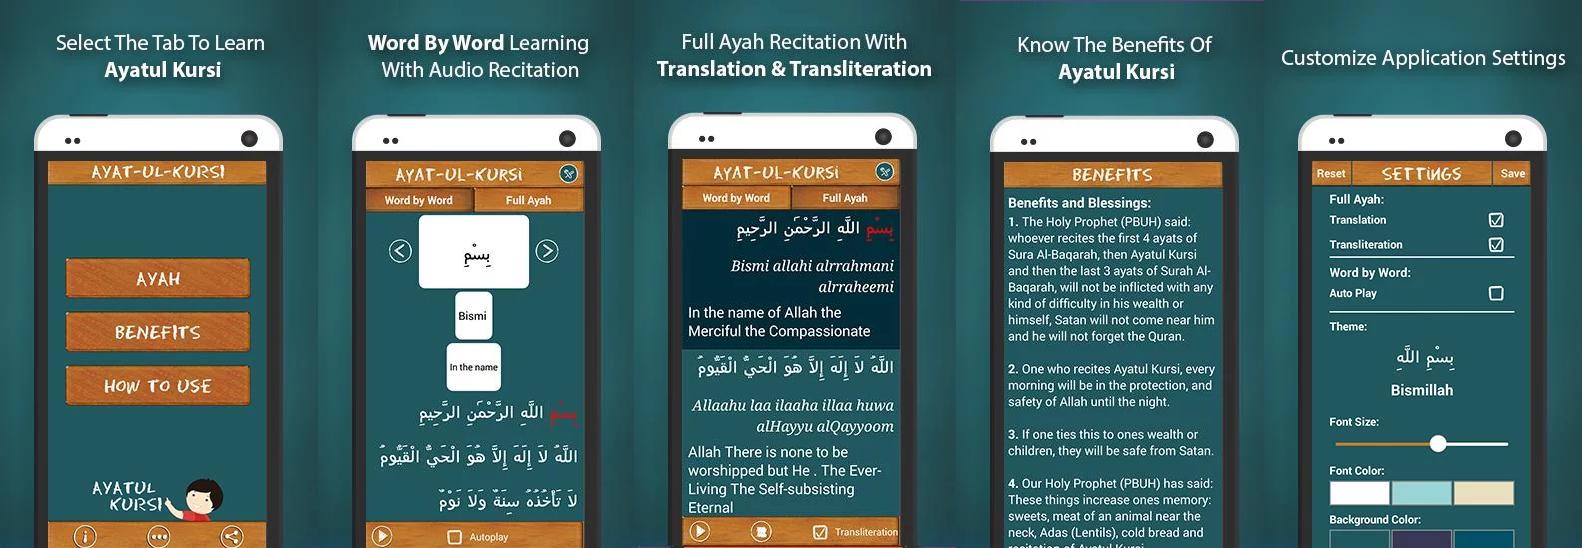 Pin by Shanza Khan on QuranReading com   Islamic teachings, Quran, Islam